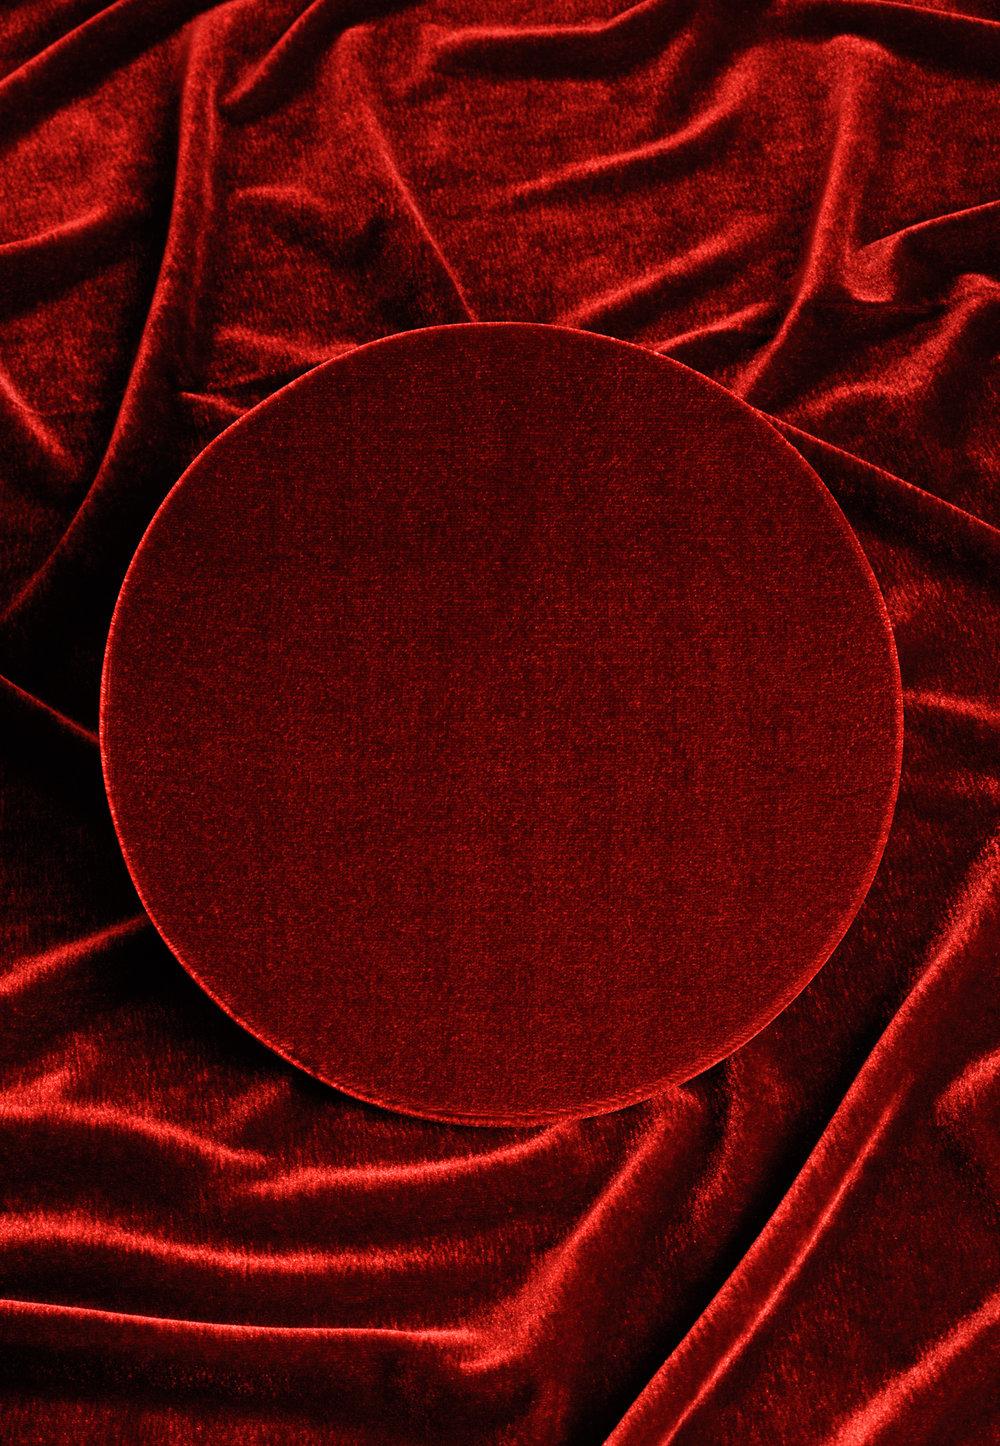 Roter Kreis 4, 2016 C-Print, 52,5 x 36 cm